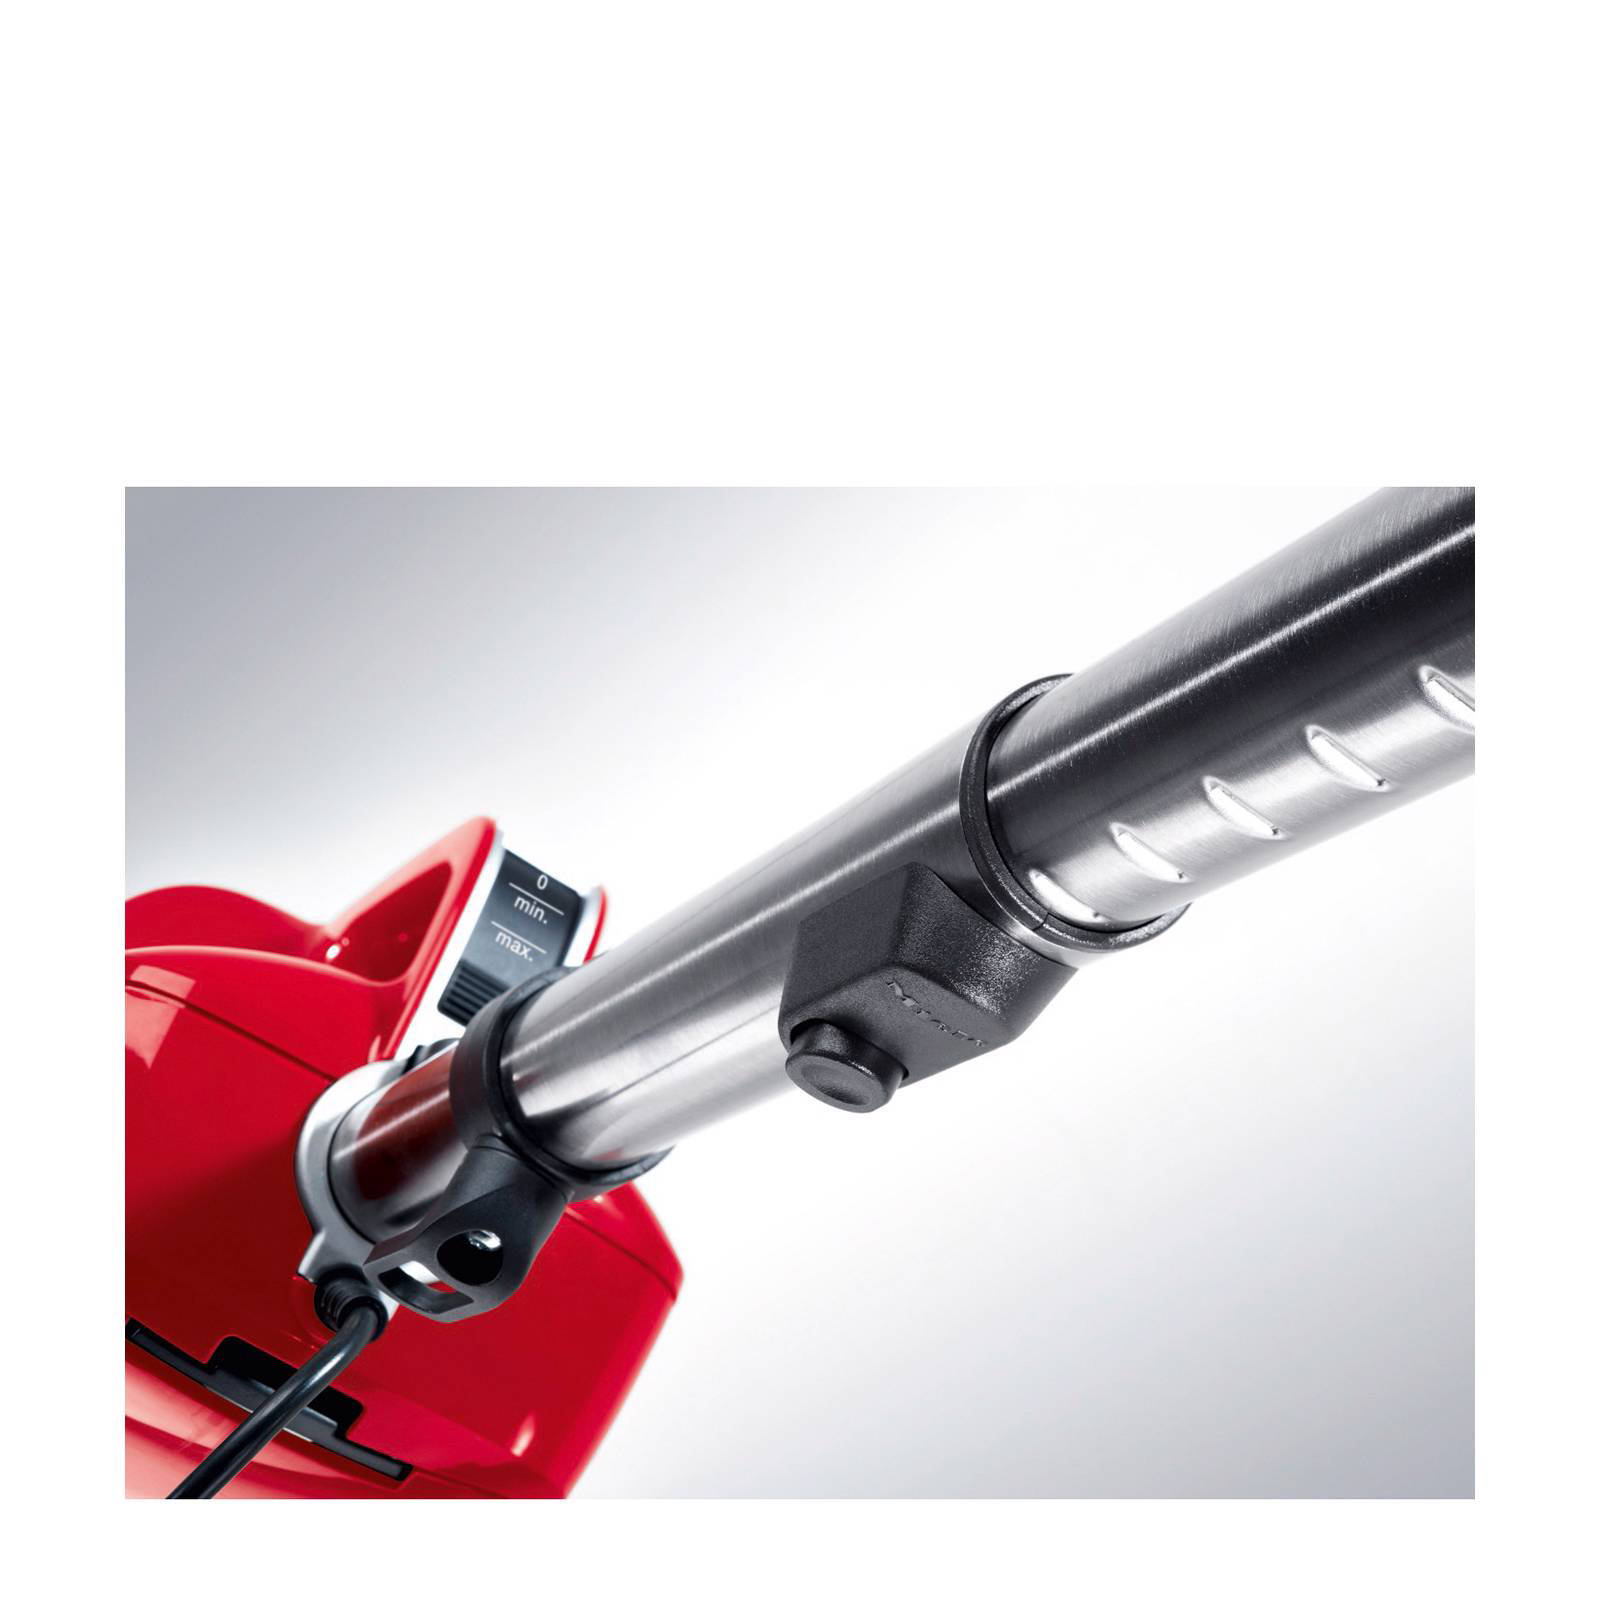 Ongebruikt Miele Swing H1 steelstofzuiger | wehkamp OZ-59